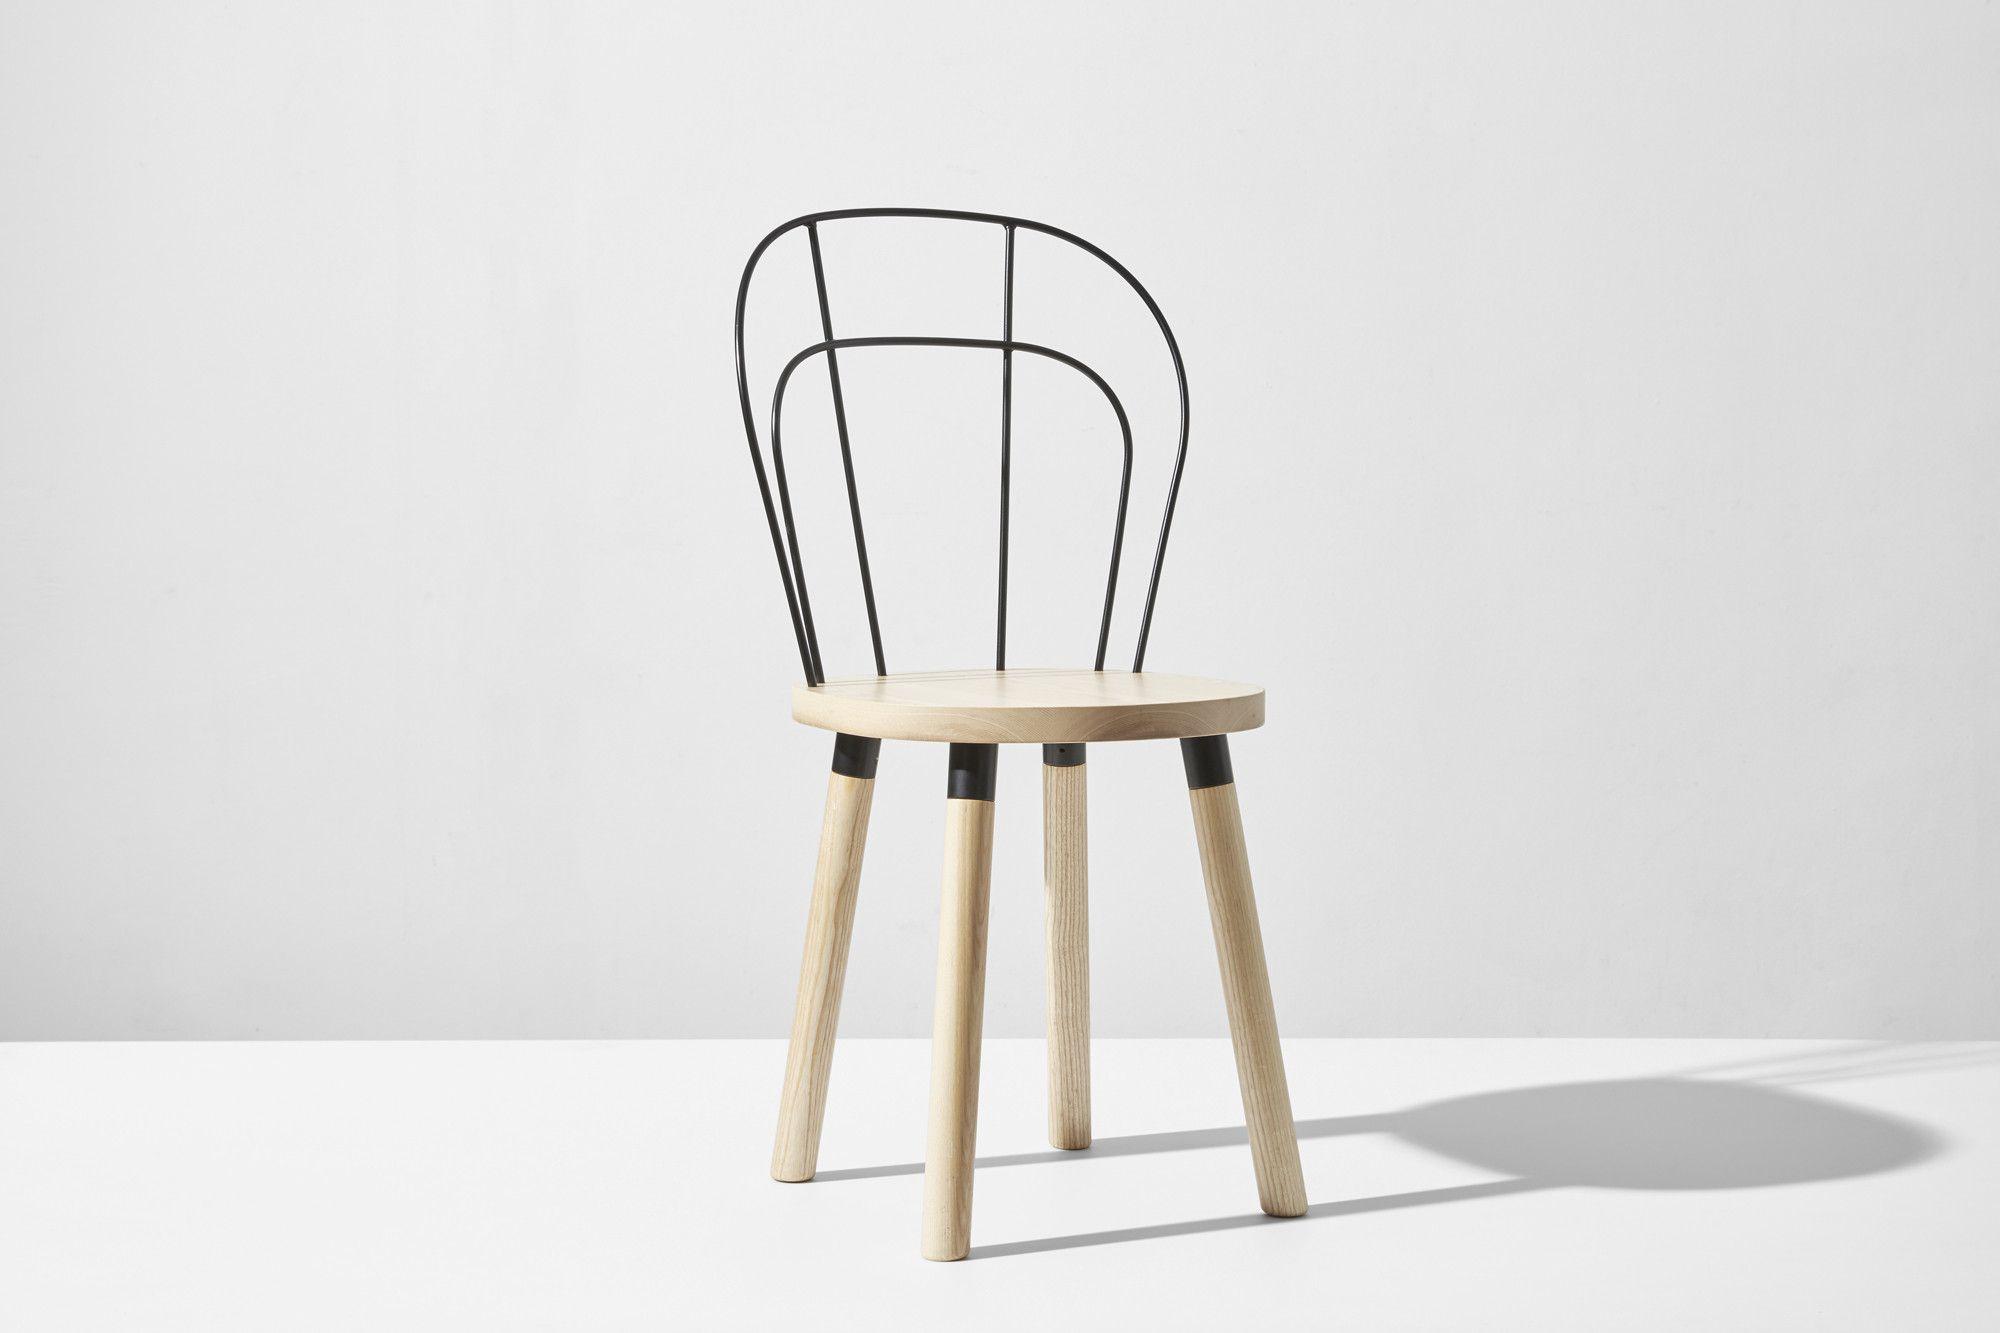 Partridge Chair 家具のアイデア 椅子 ダイニングチェア